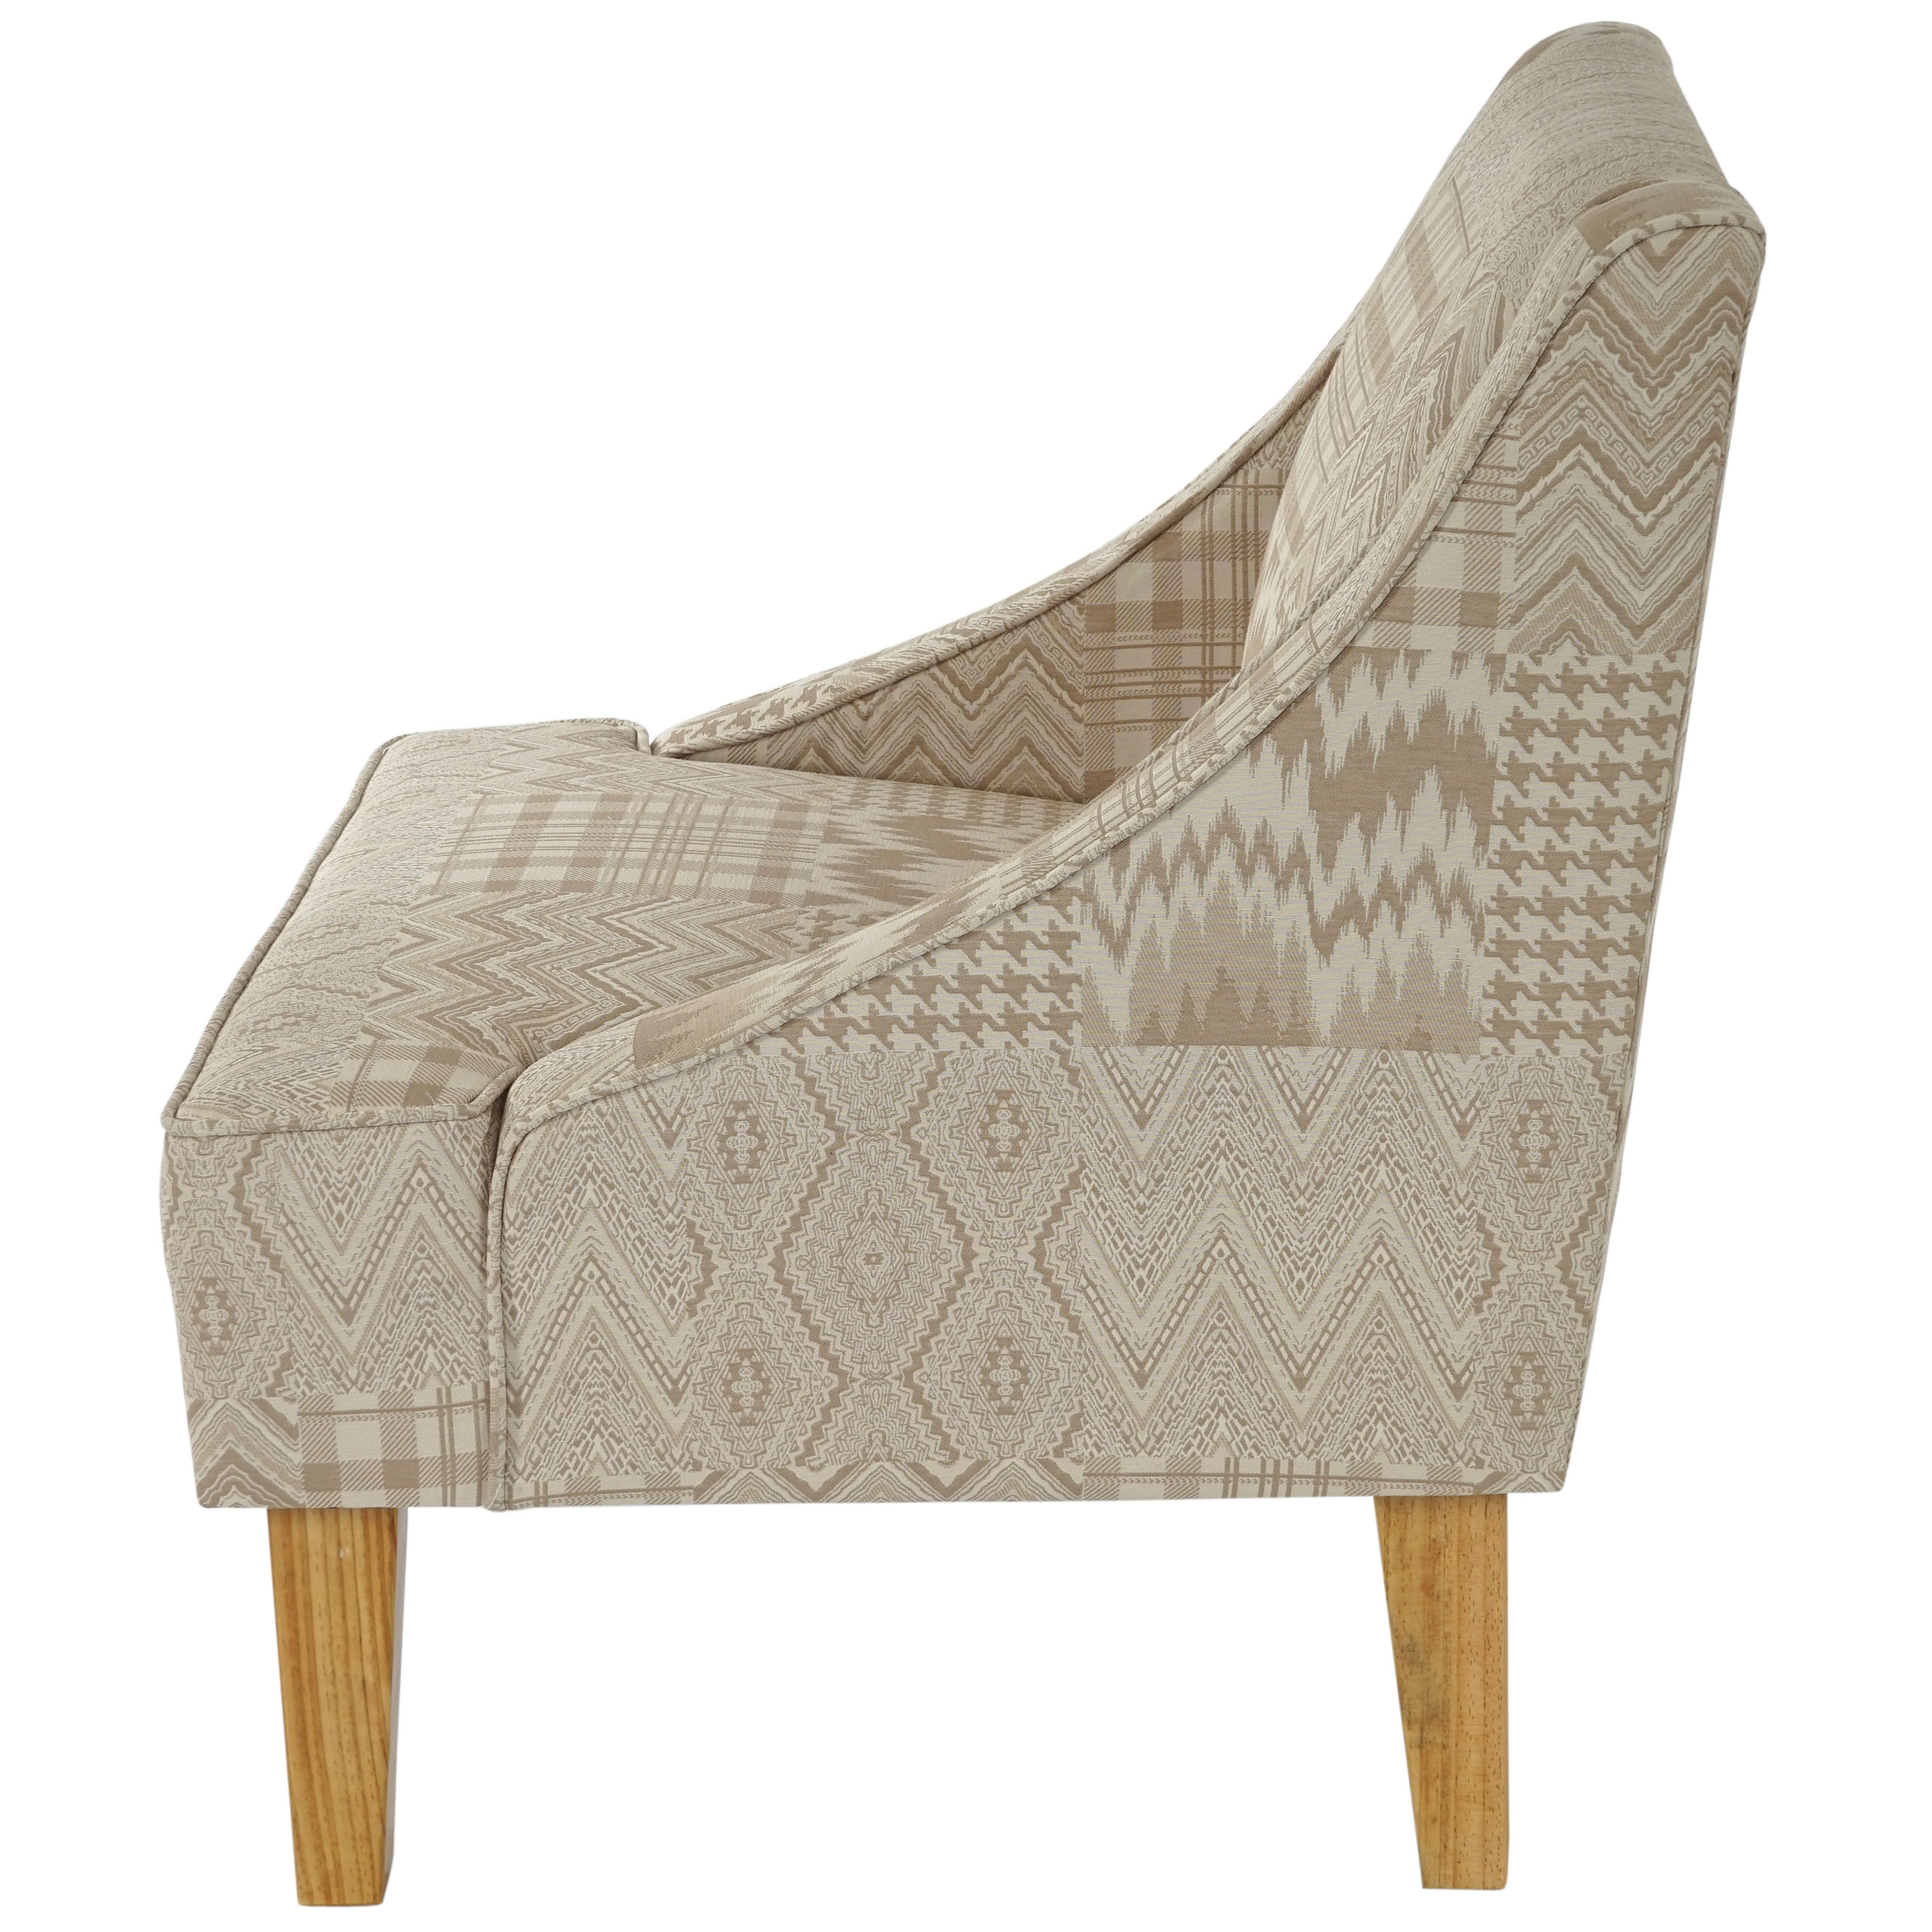 Sessel Malmö T371 Retro 50er Jahre Design Stoff Textil